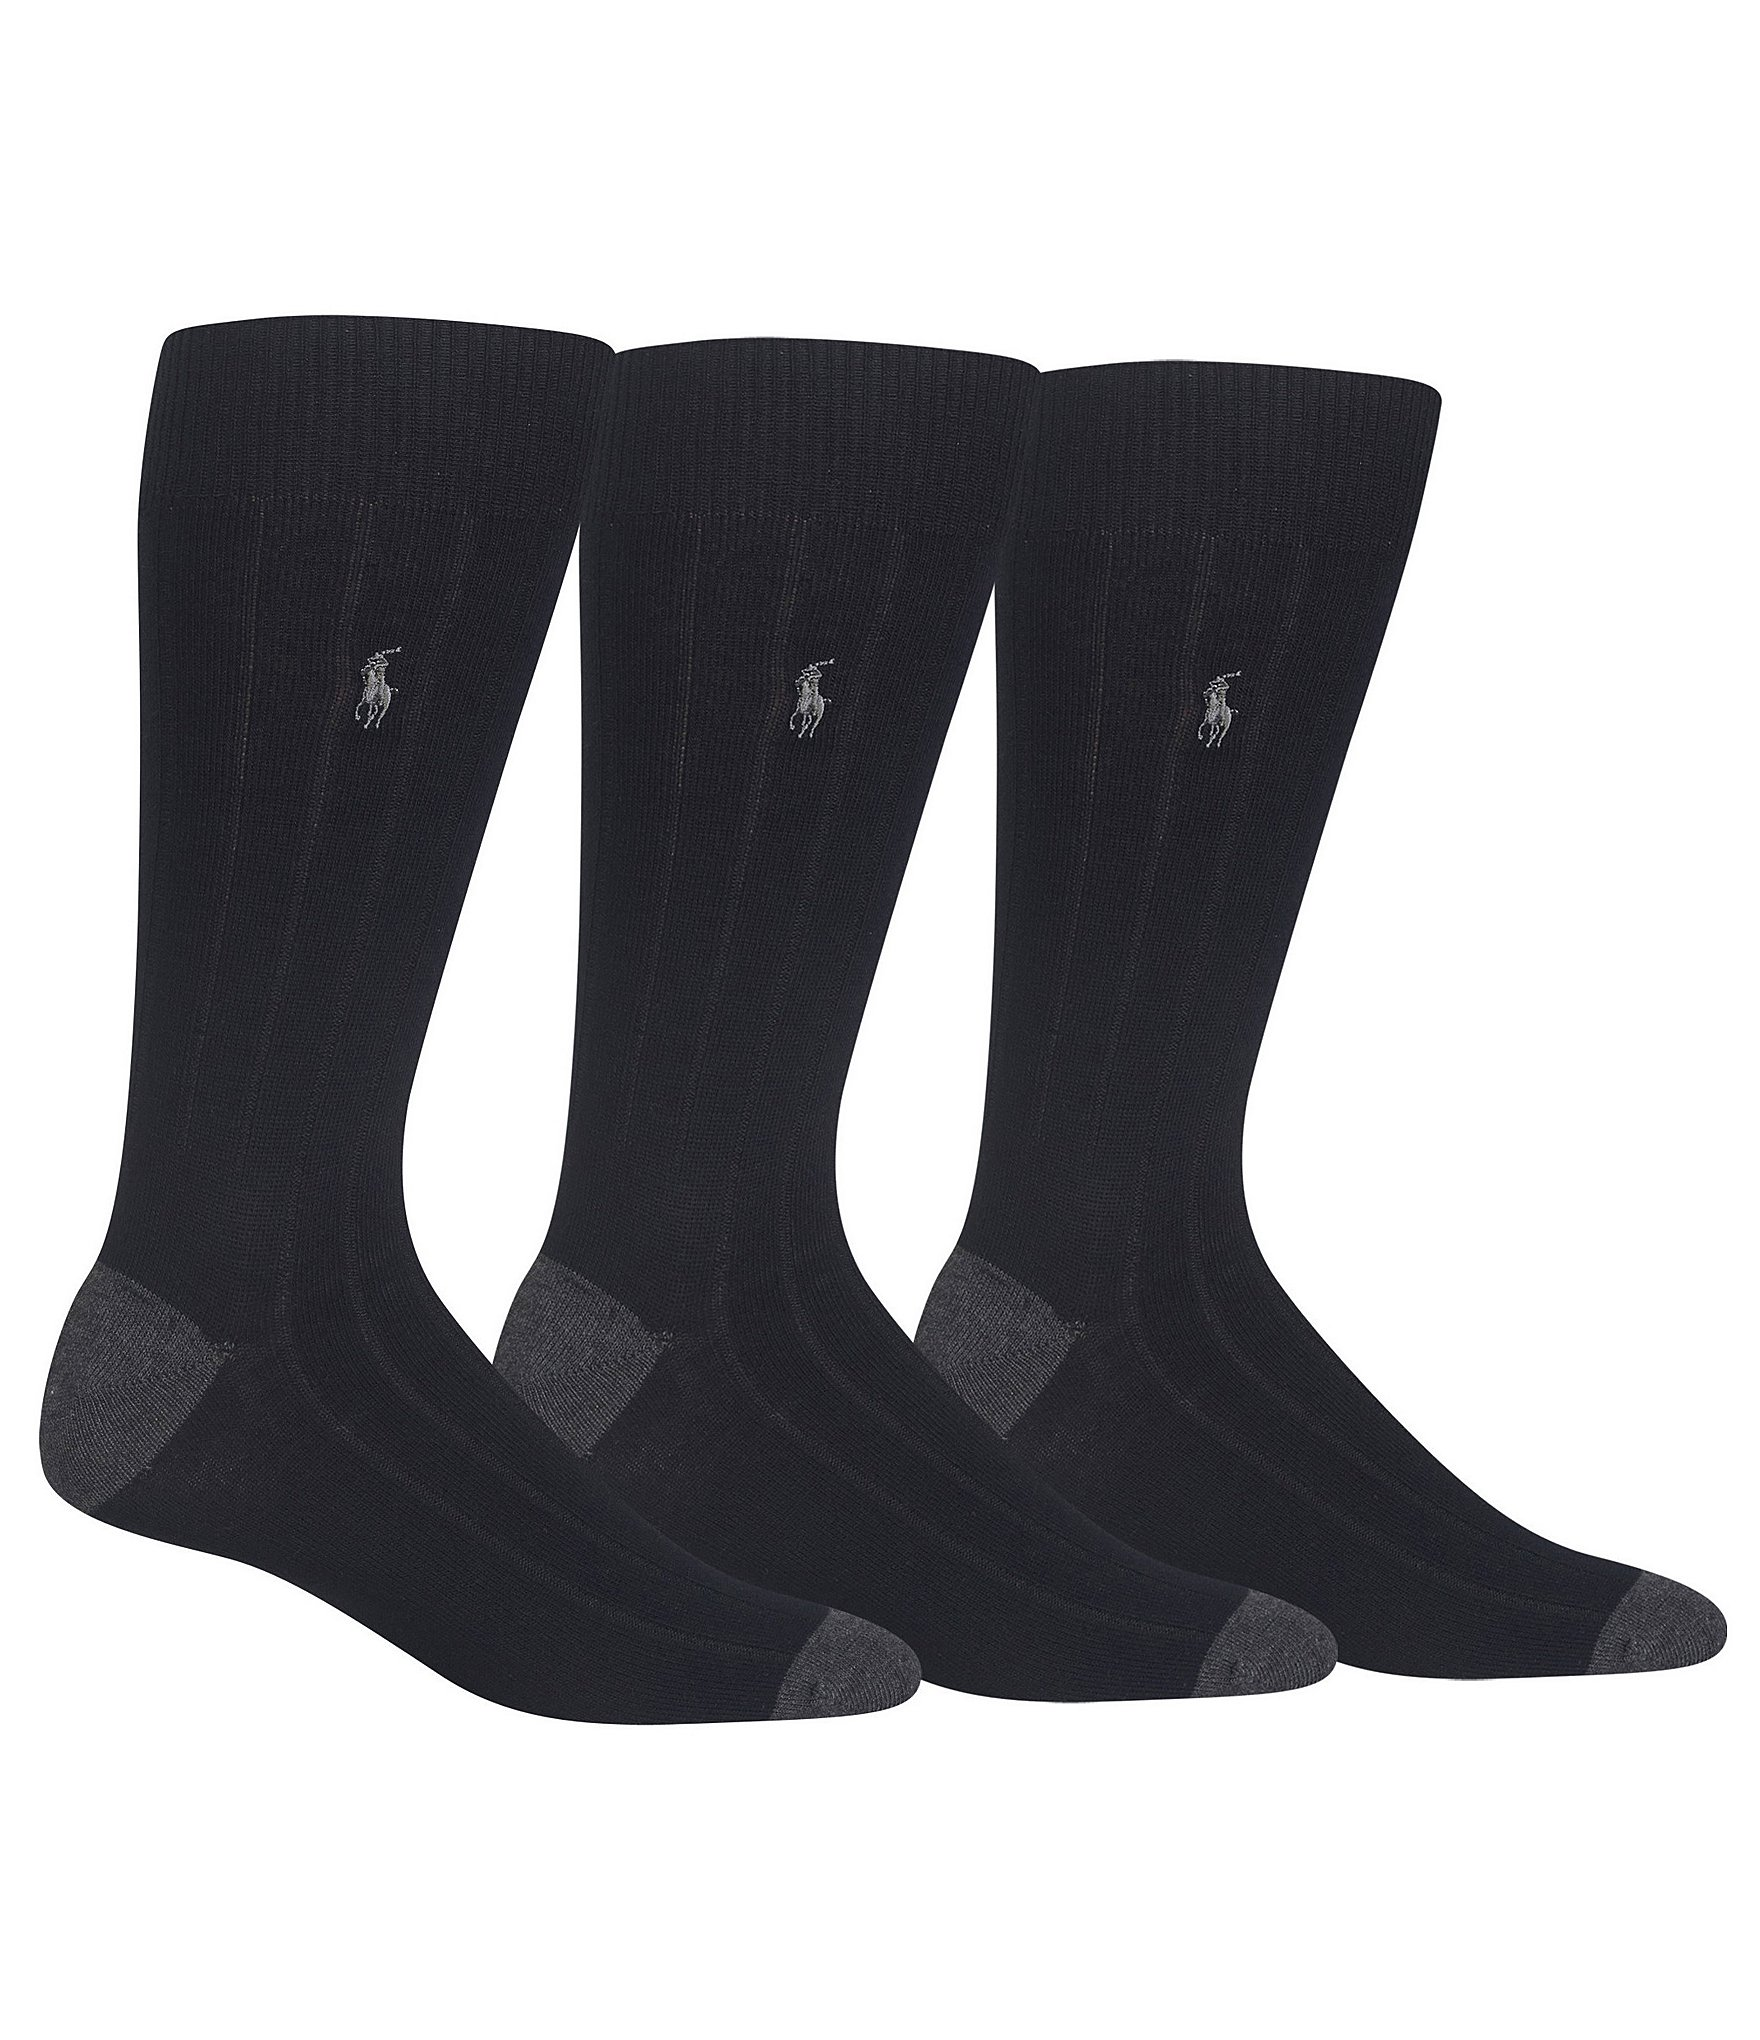 Polo Ralph Lauren Soft Touch Dress Socks 3-Pack  39d9f3dbeedf